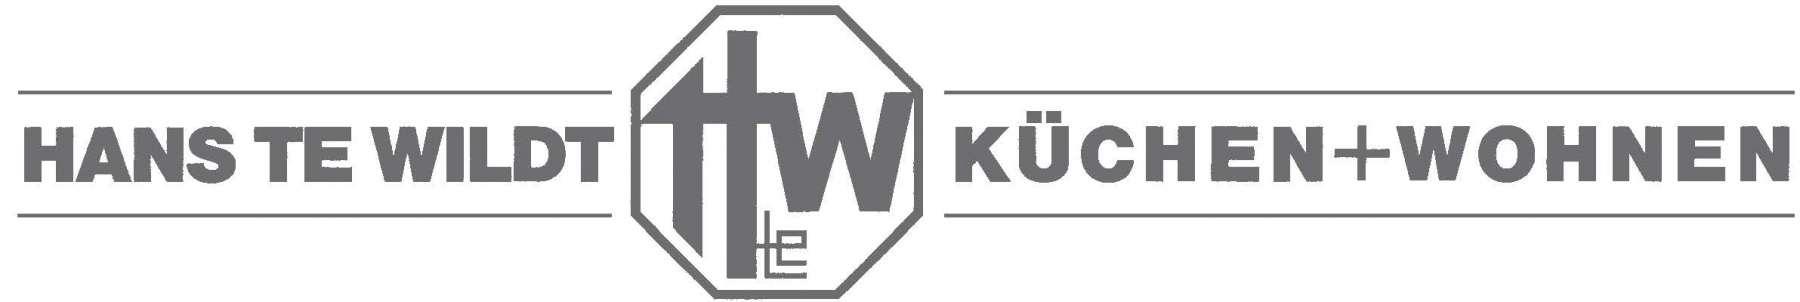 teWildt_Logo